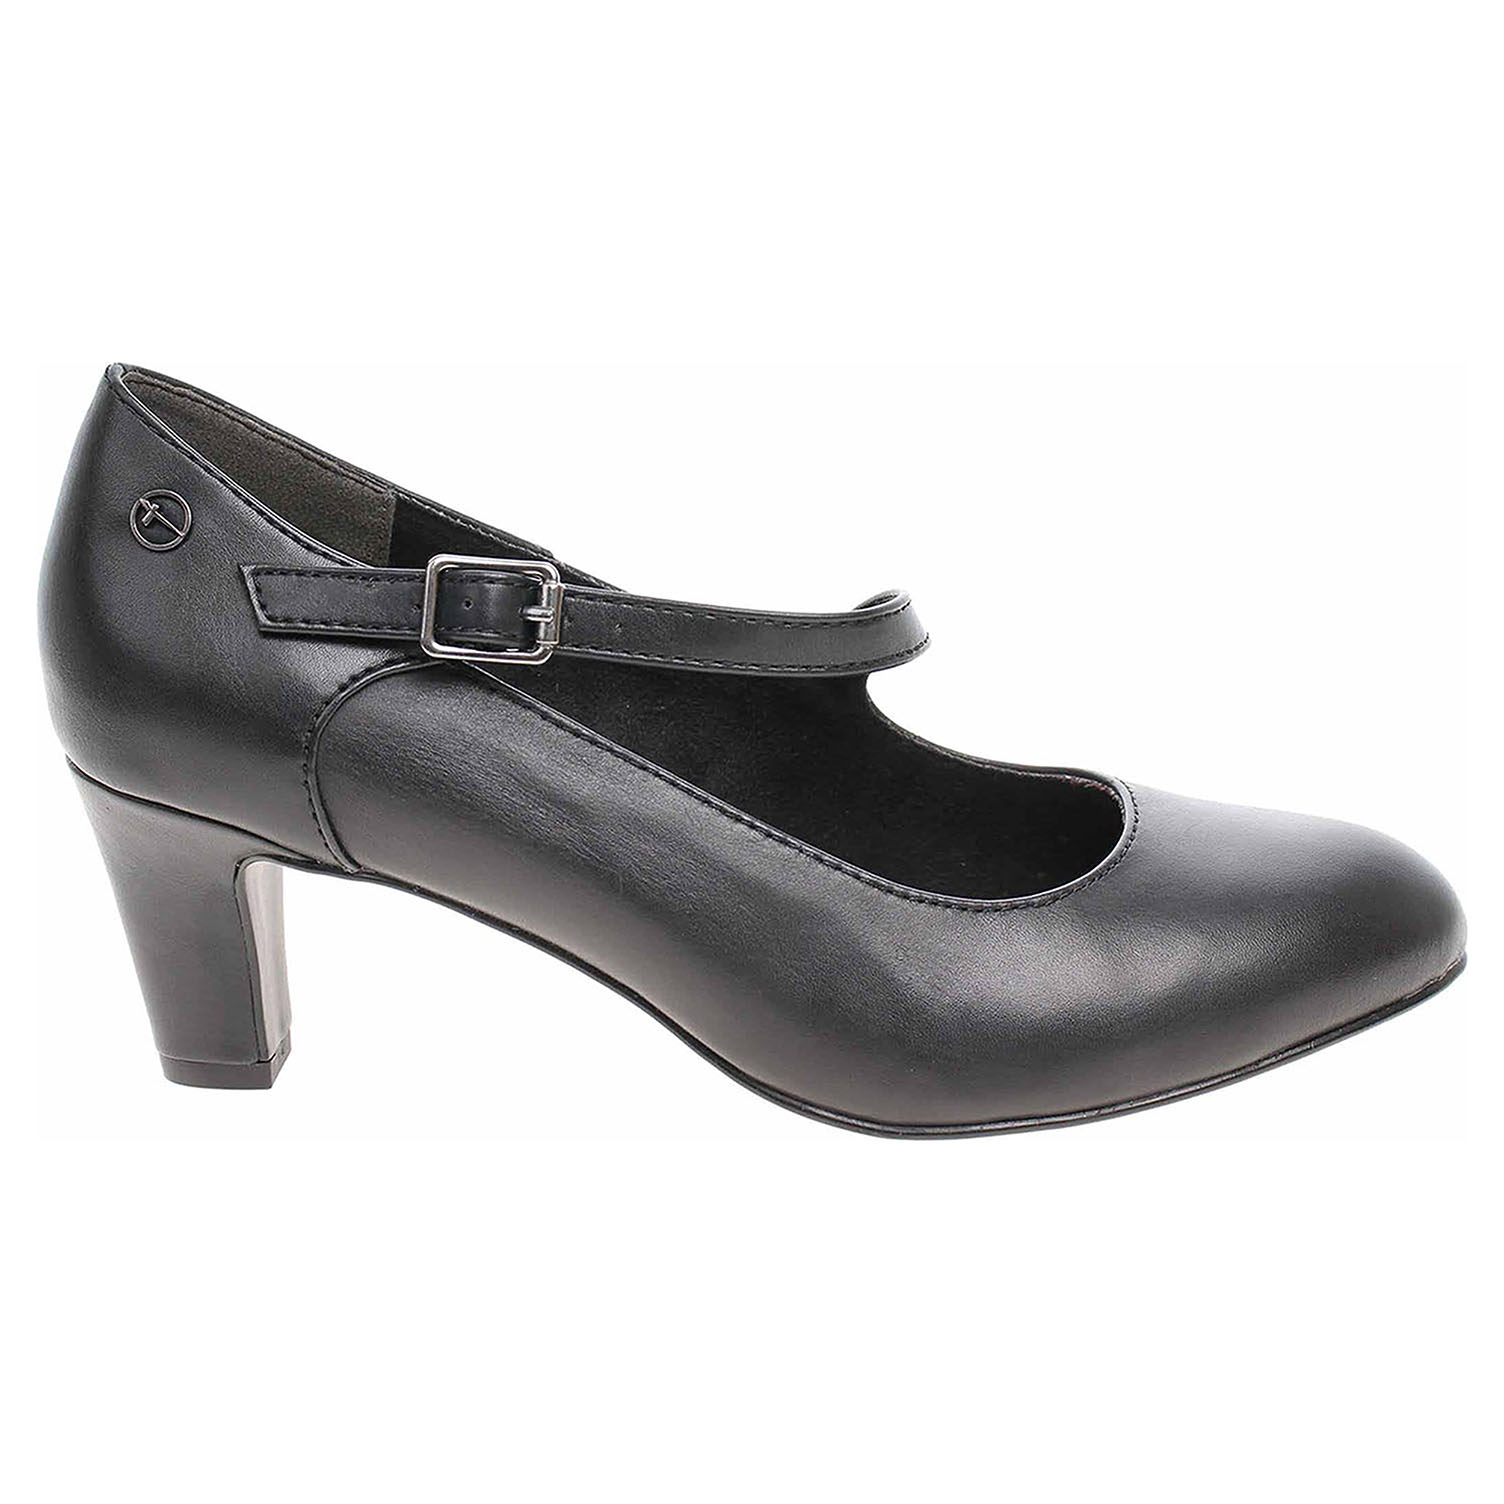 fb6f853f145c Tamaris dámské lodičky 1-24402-21 black leather 1-1-24402-